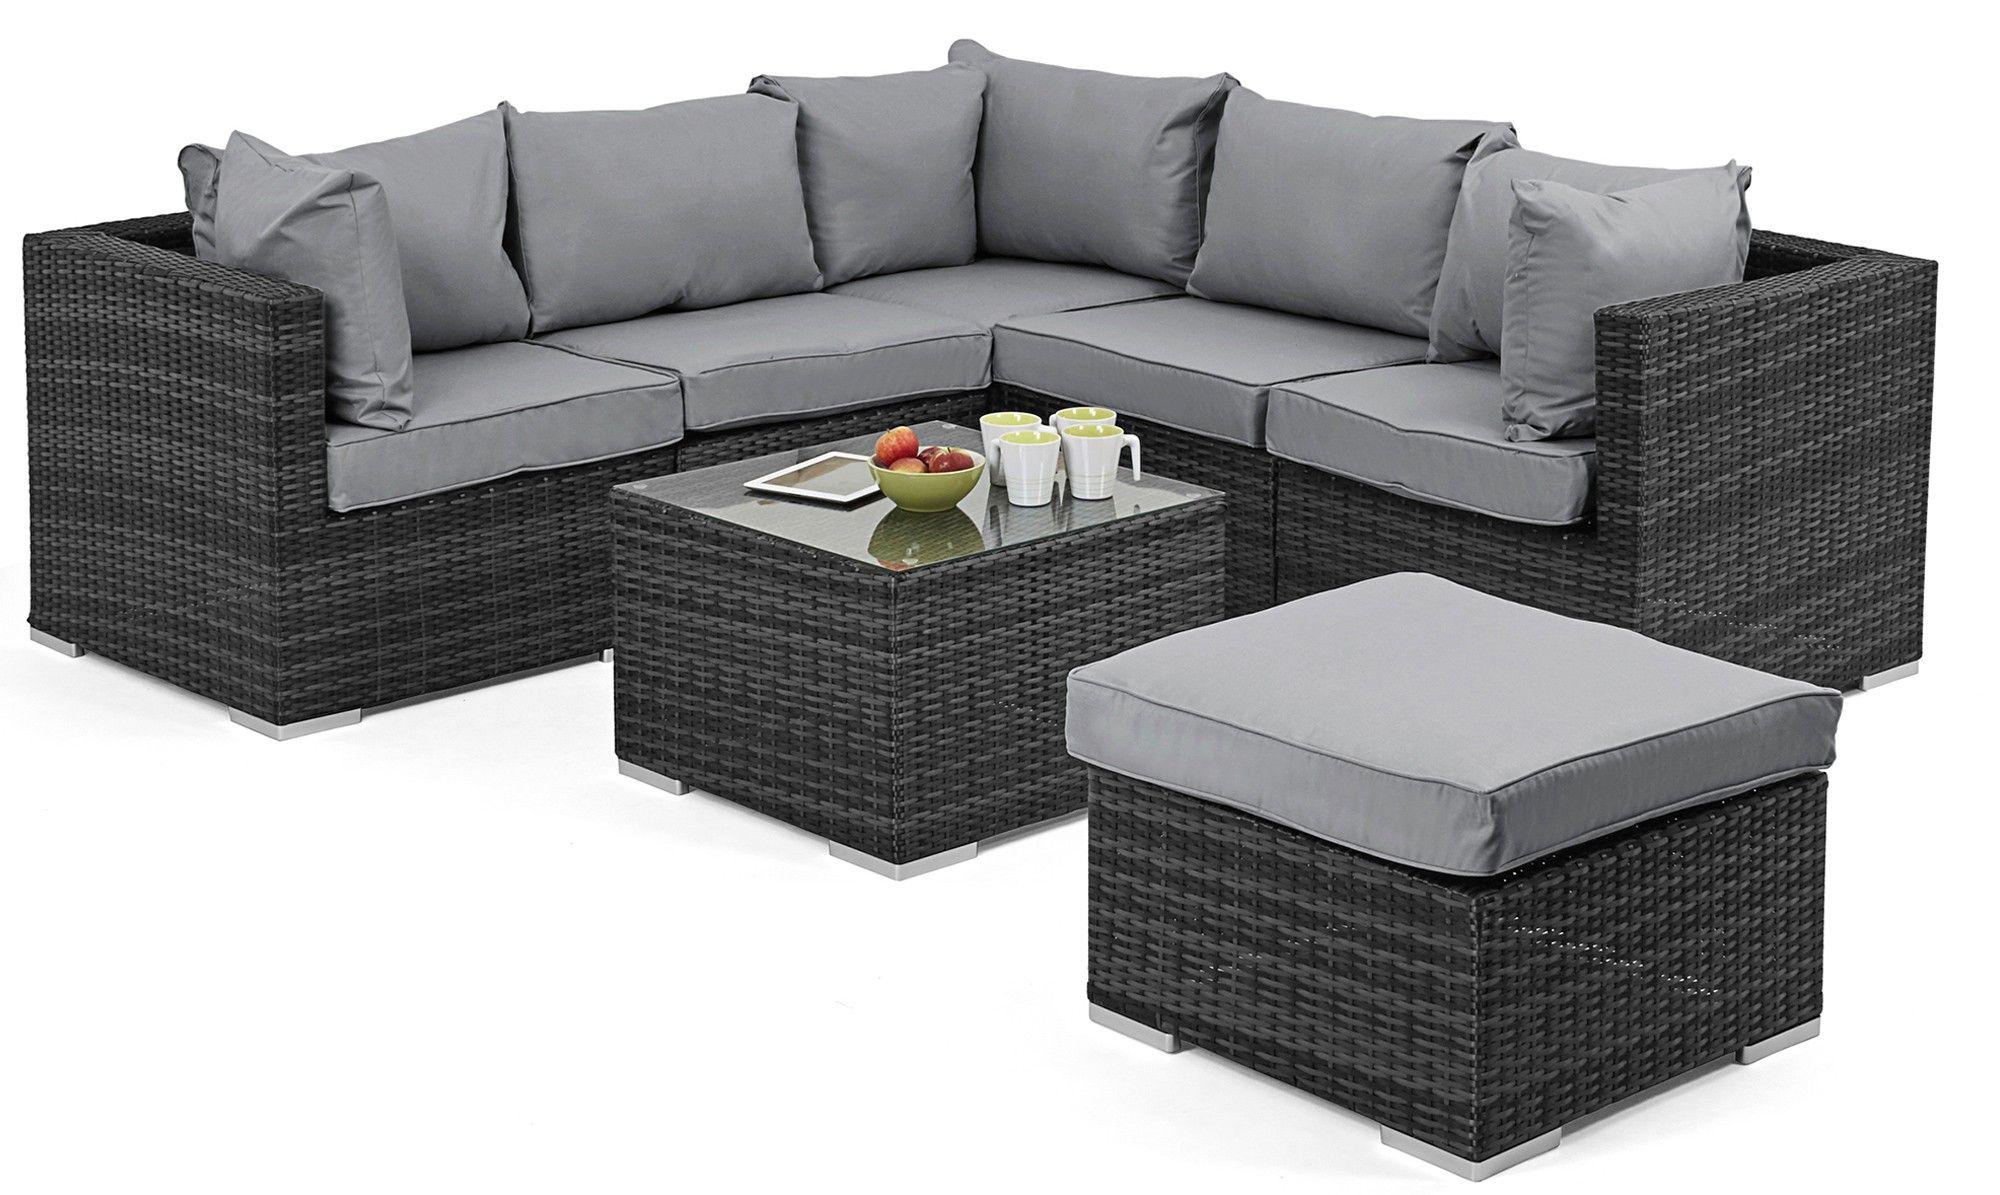 naples corner sofa grey rattan garden set rattan sofa sets fishpools - Garden Furniture Corner Sofa